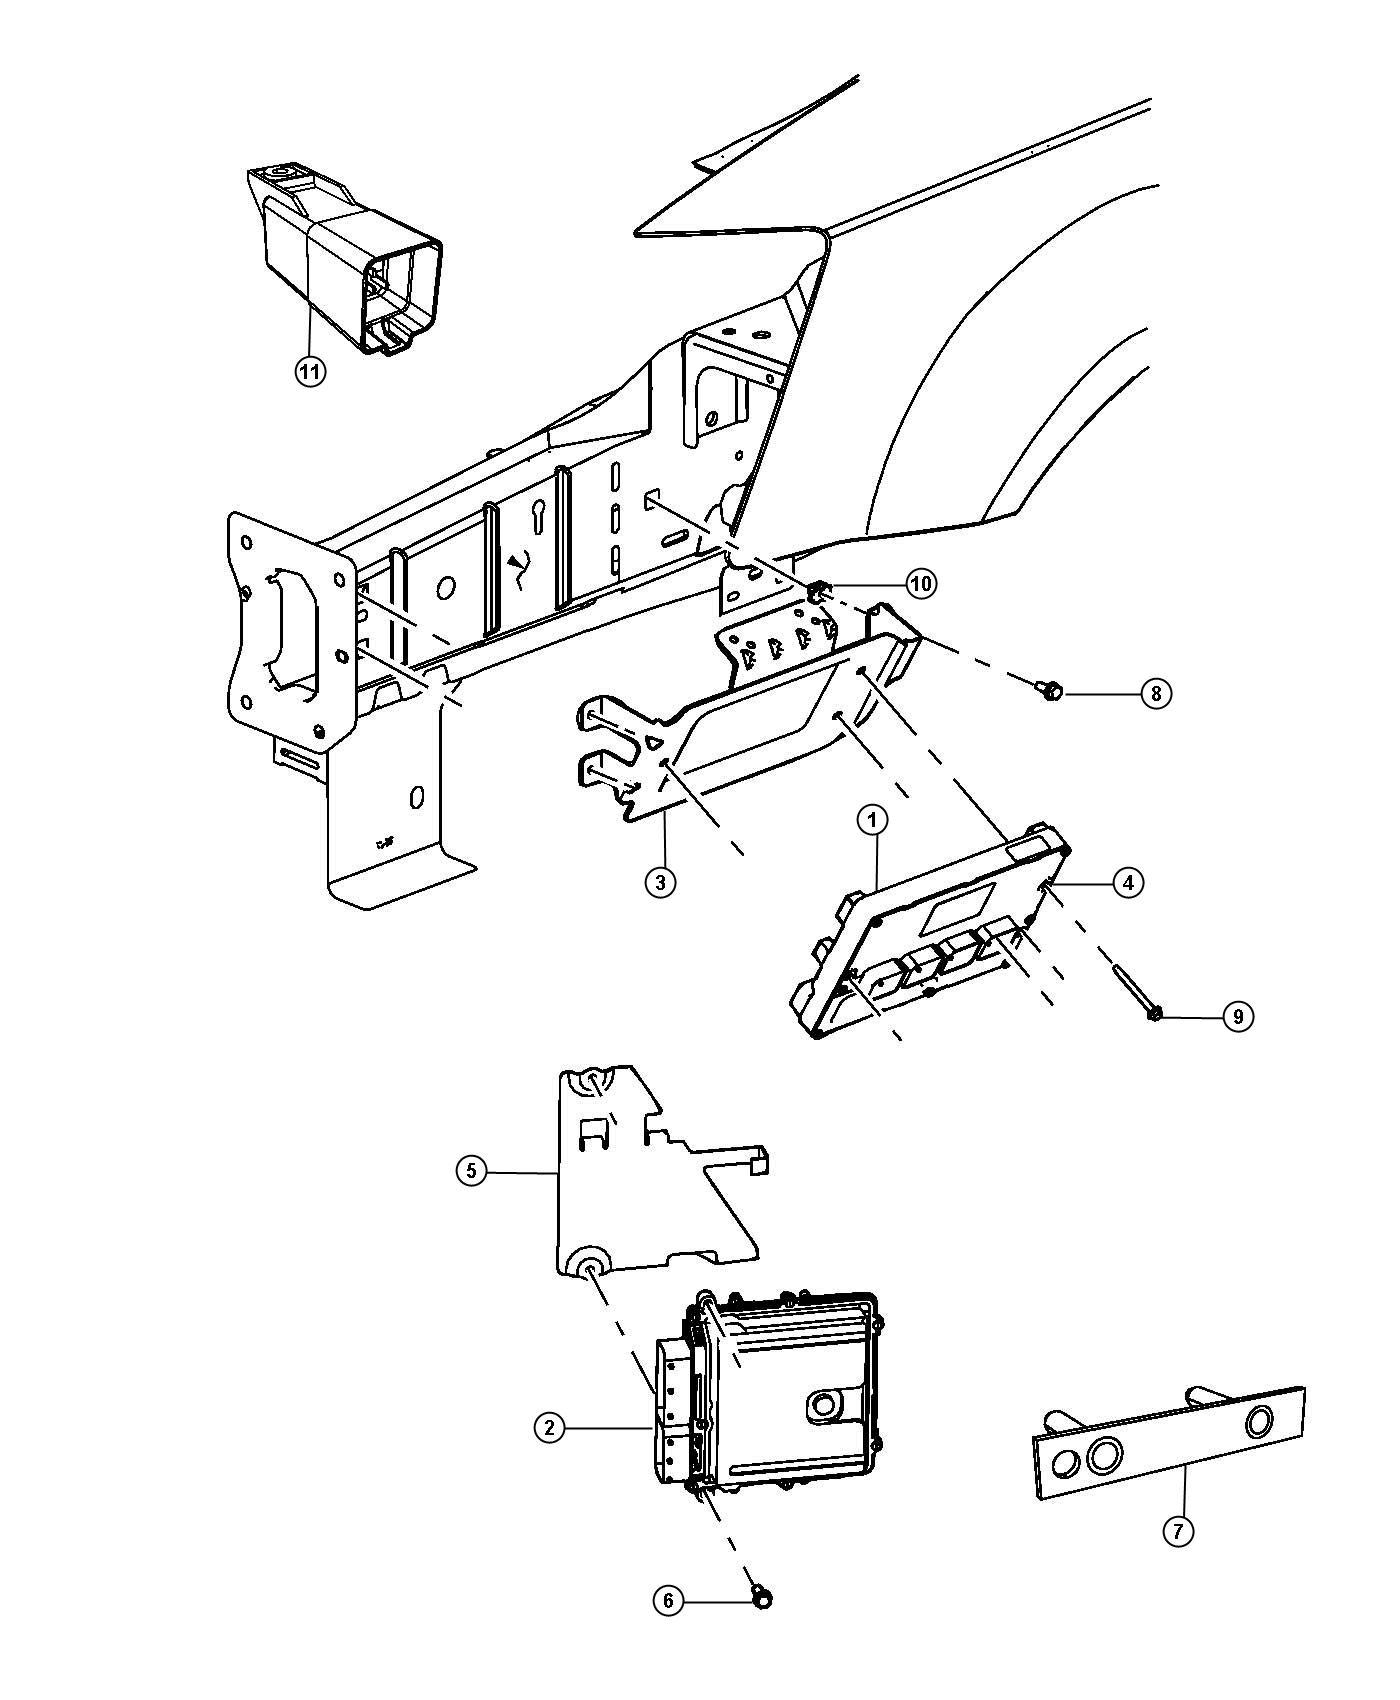 2013 Dodge Module  Glow Plug  Modules  Compartment  Engine